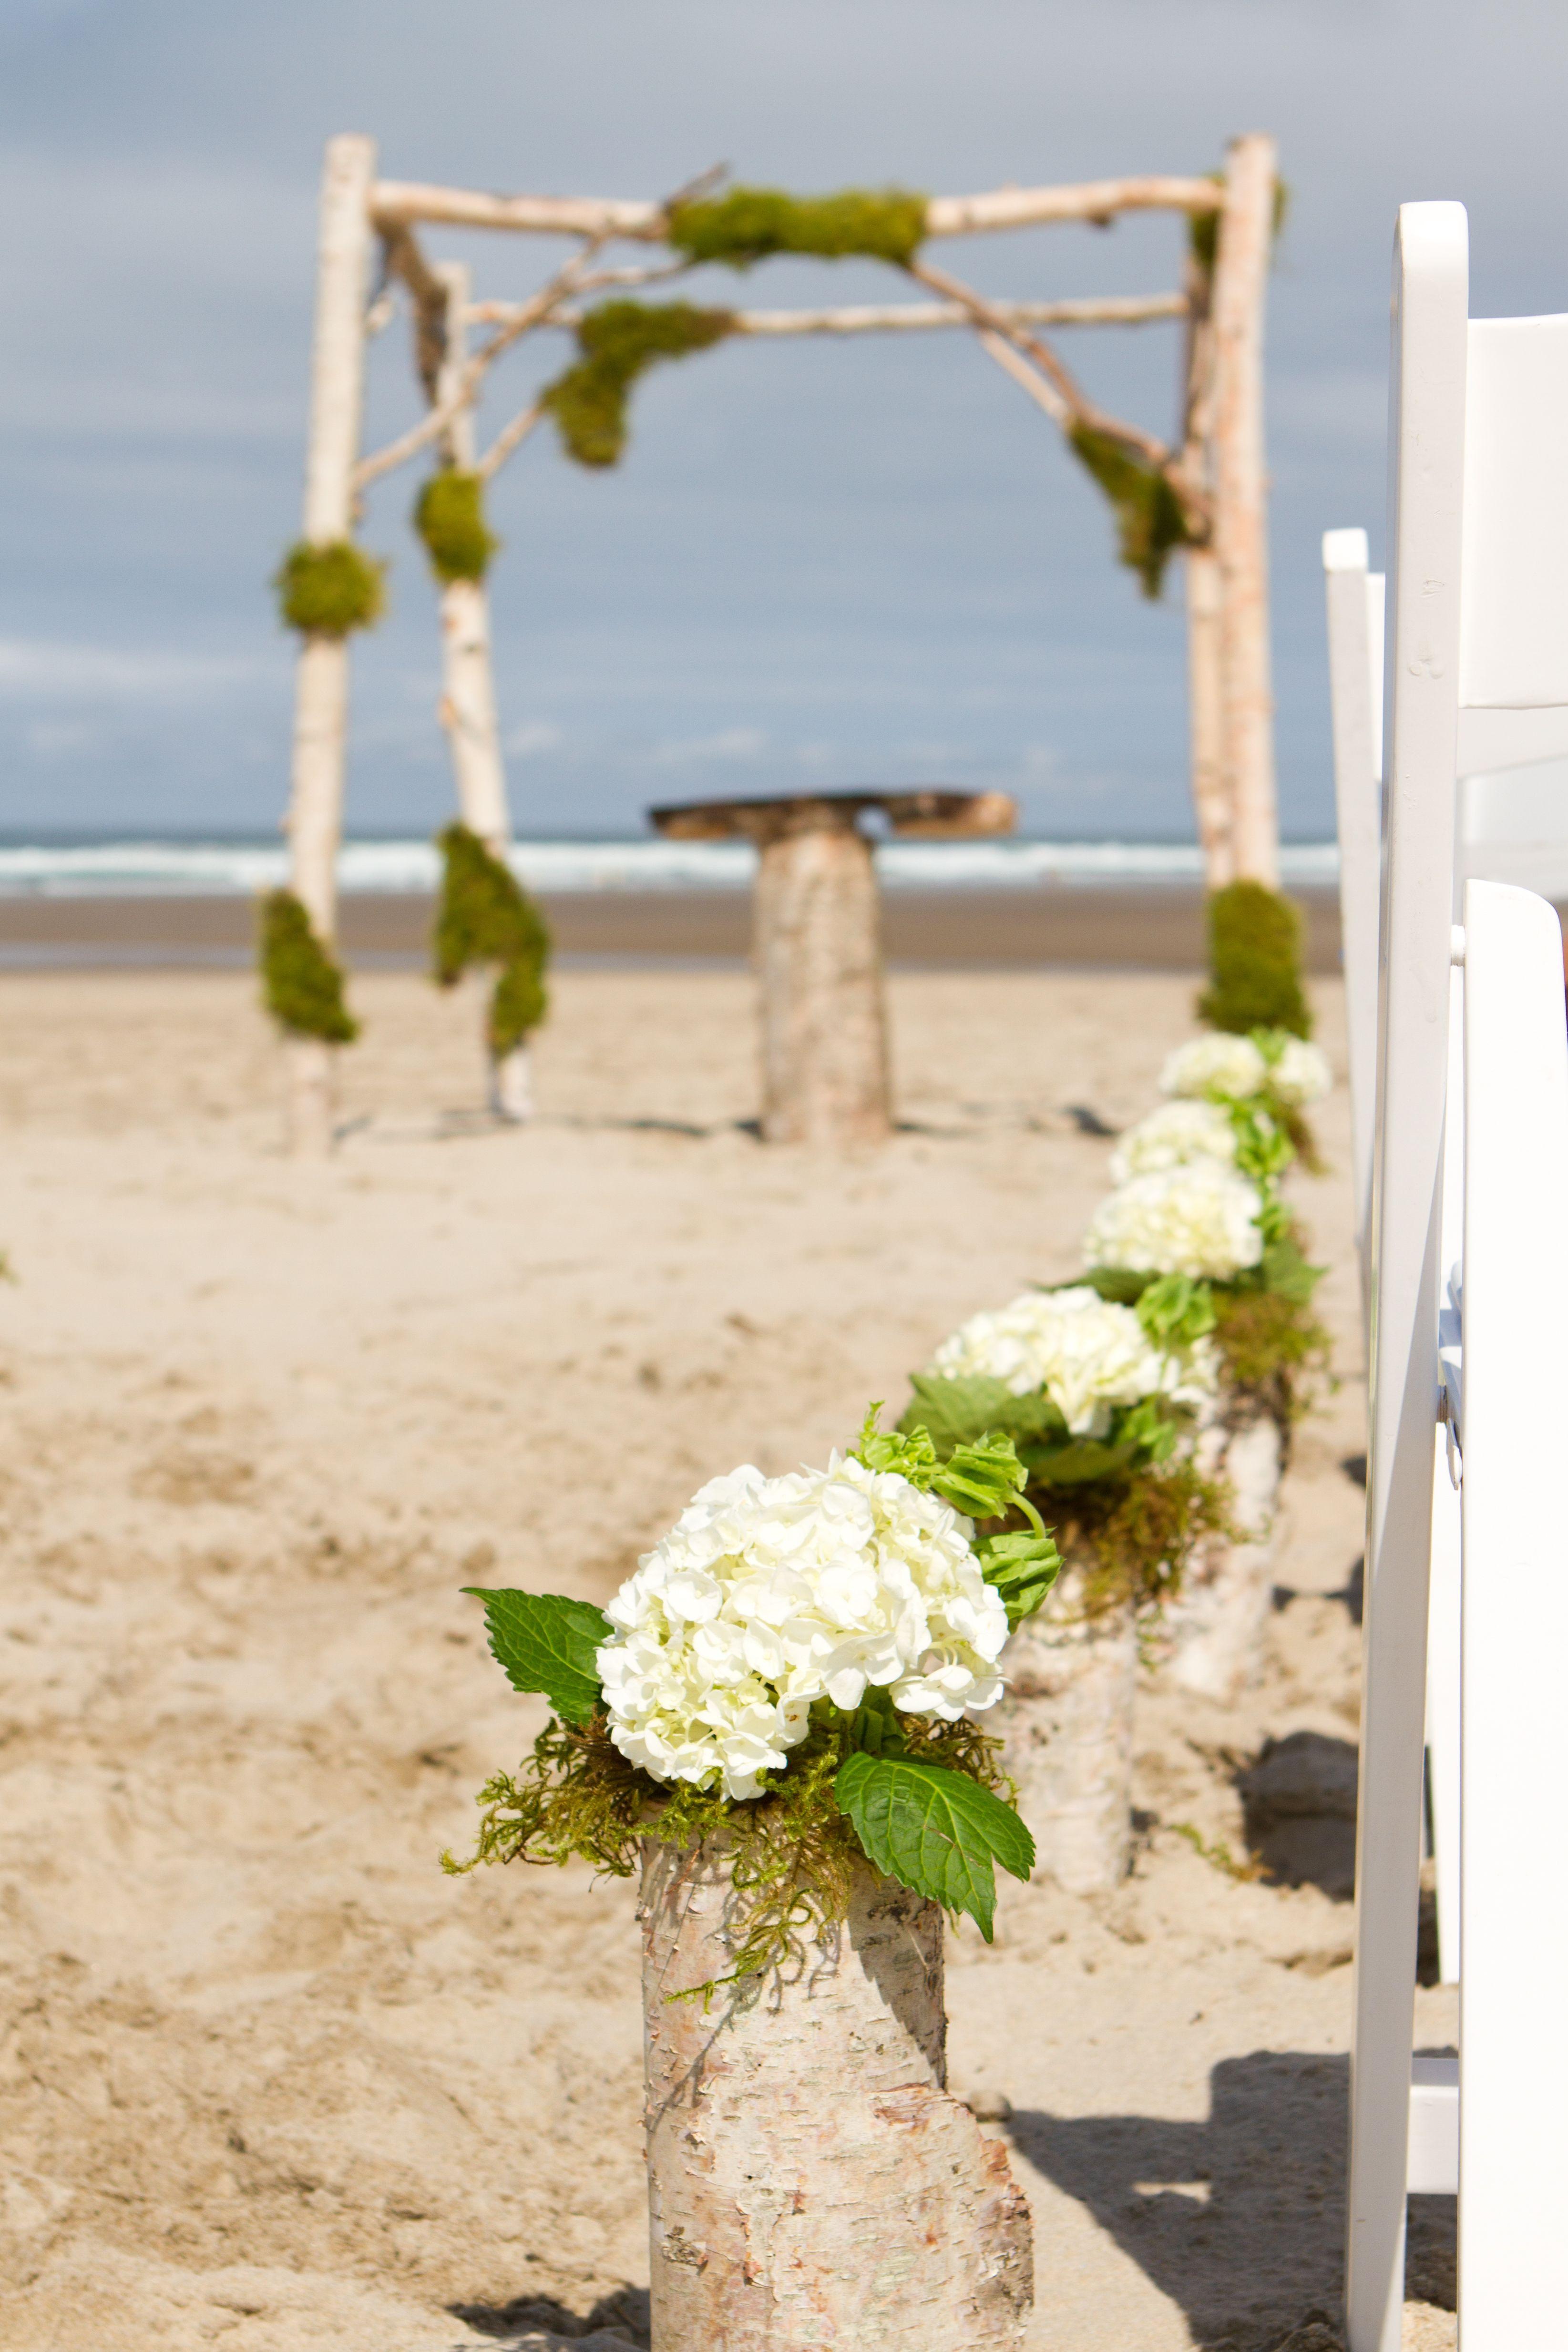 Simple But Elegant Beach Wedding Aisle Decorations Birch Logs